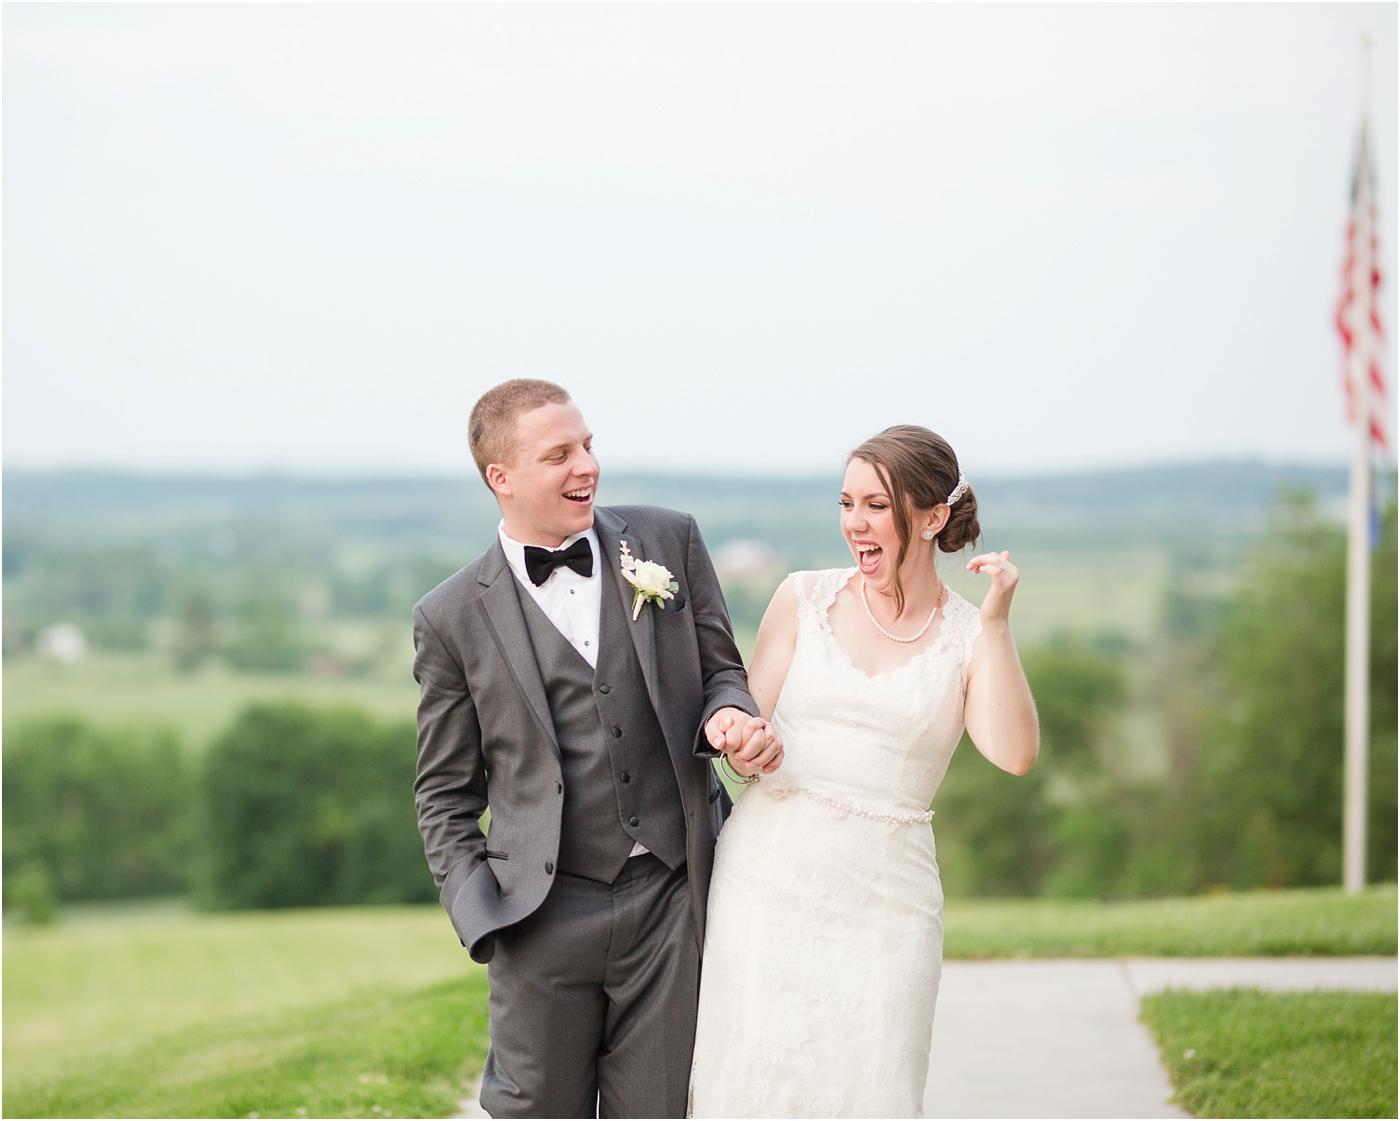 Gettysburg-lodges-wedding-photos-98.jpg